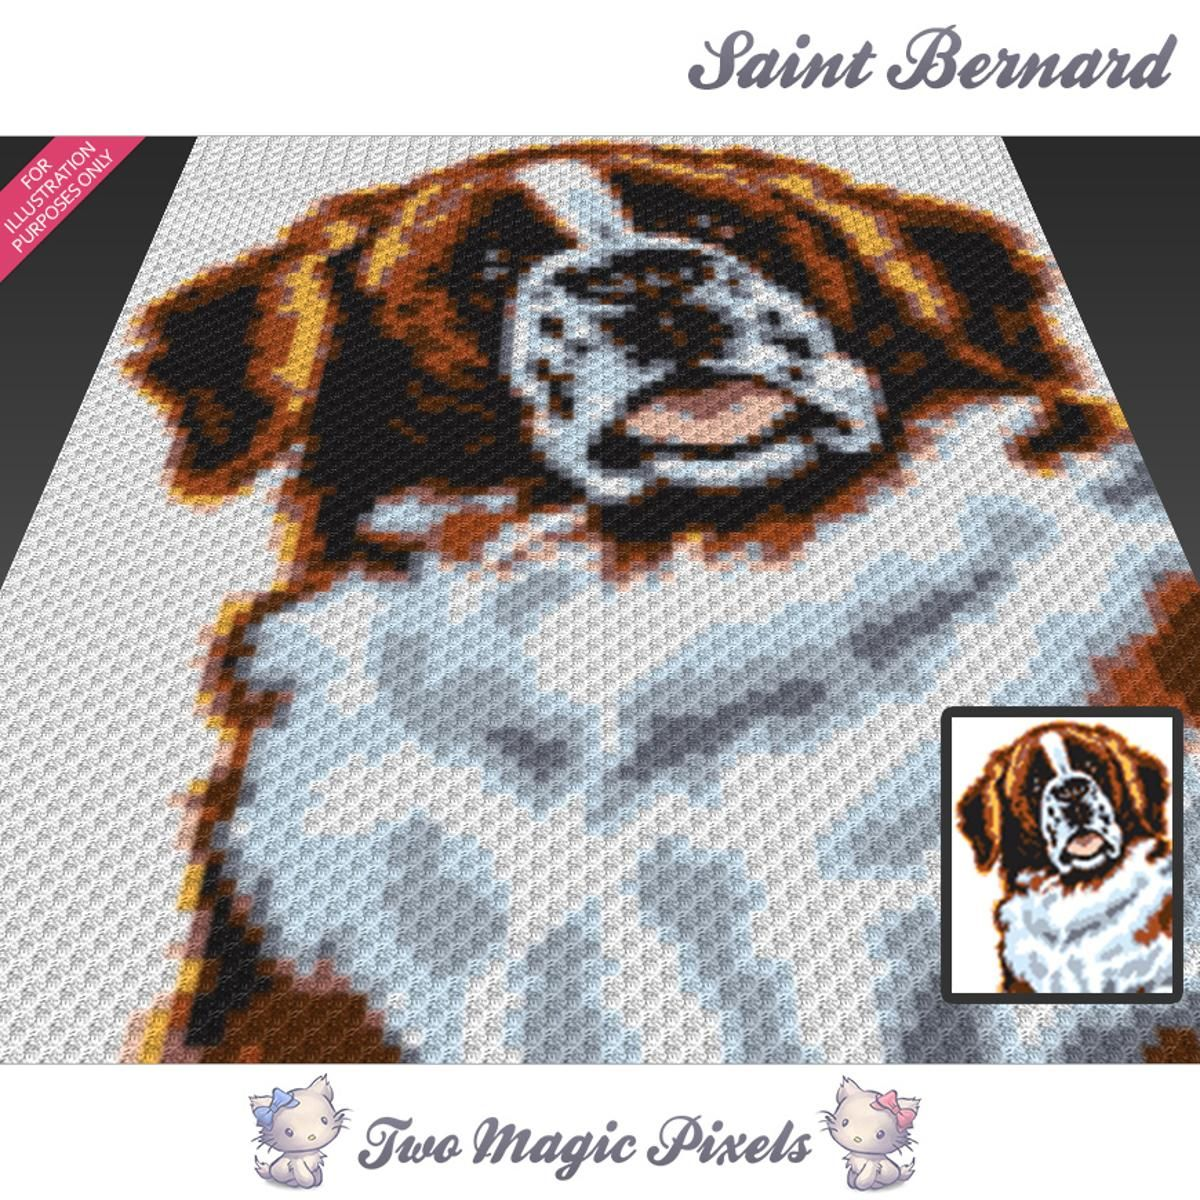 Saint Bernard Crochet Graph (C2C Counts Included)